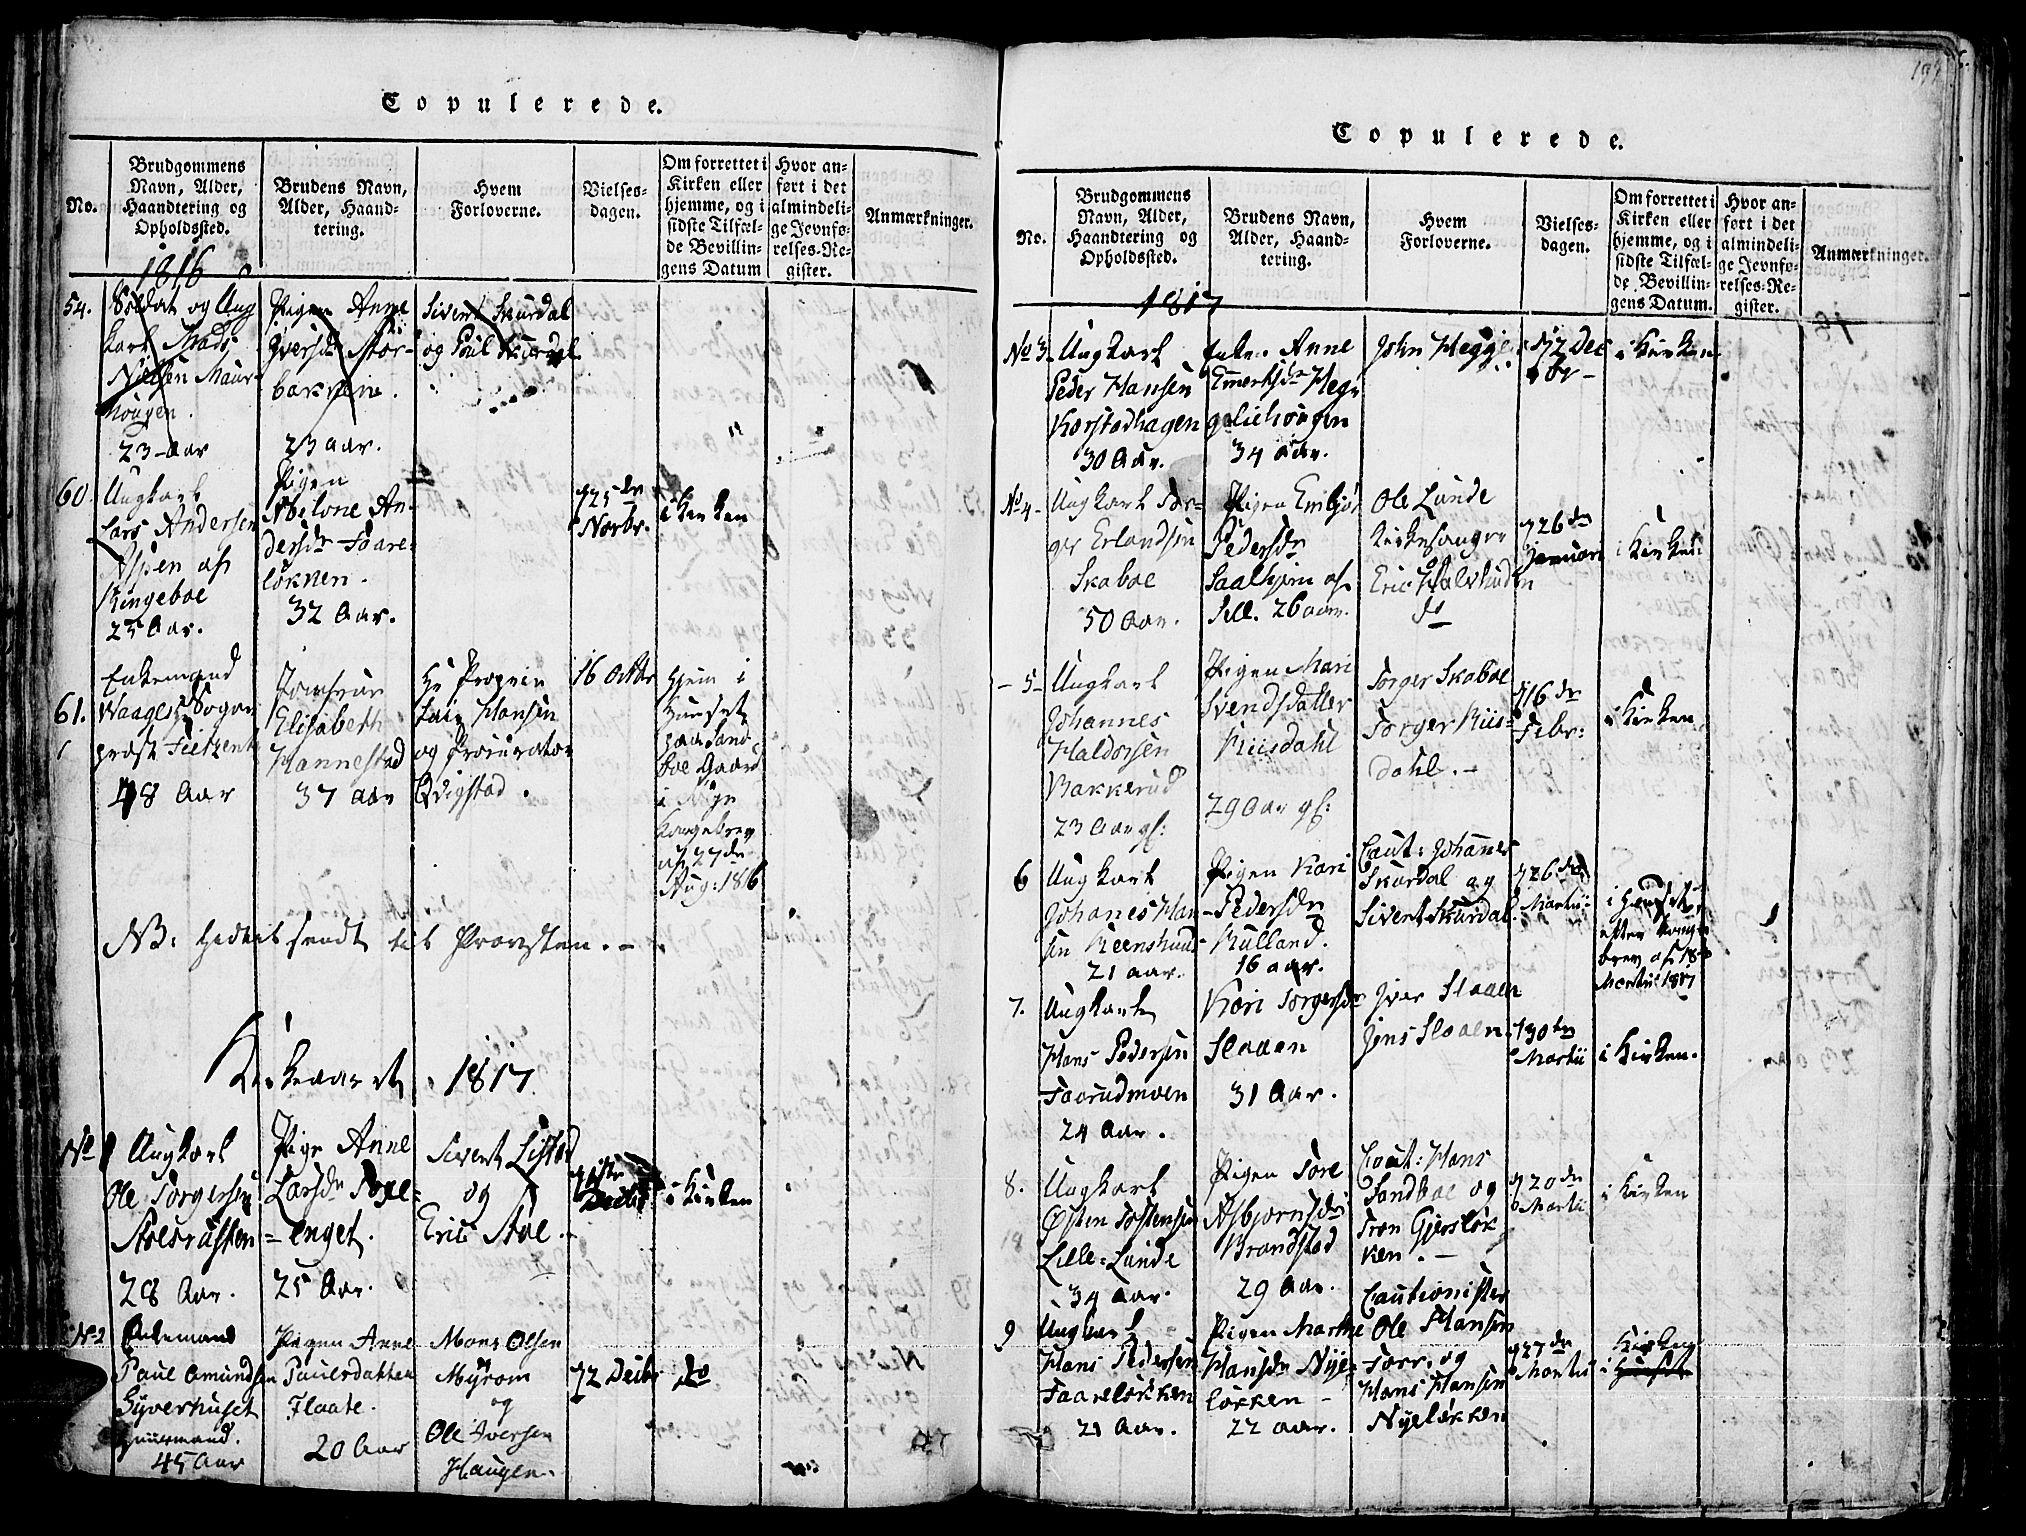 SAH, Fron prestekontor, H/Ha/Haa/L0002: Ministerialbok nr. 2, 1816-1827, s. 197